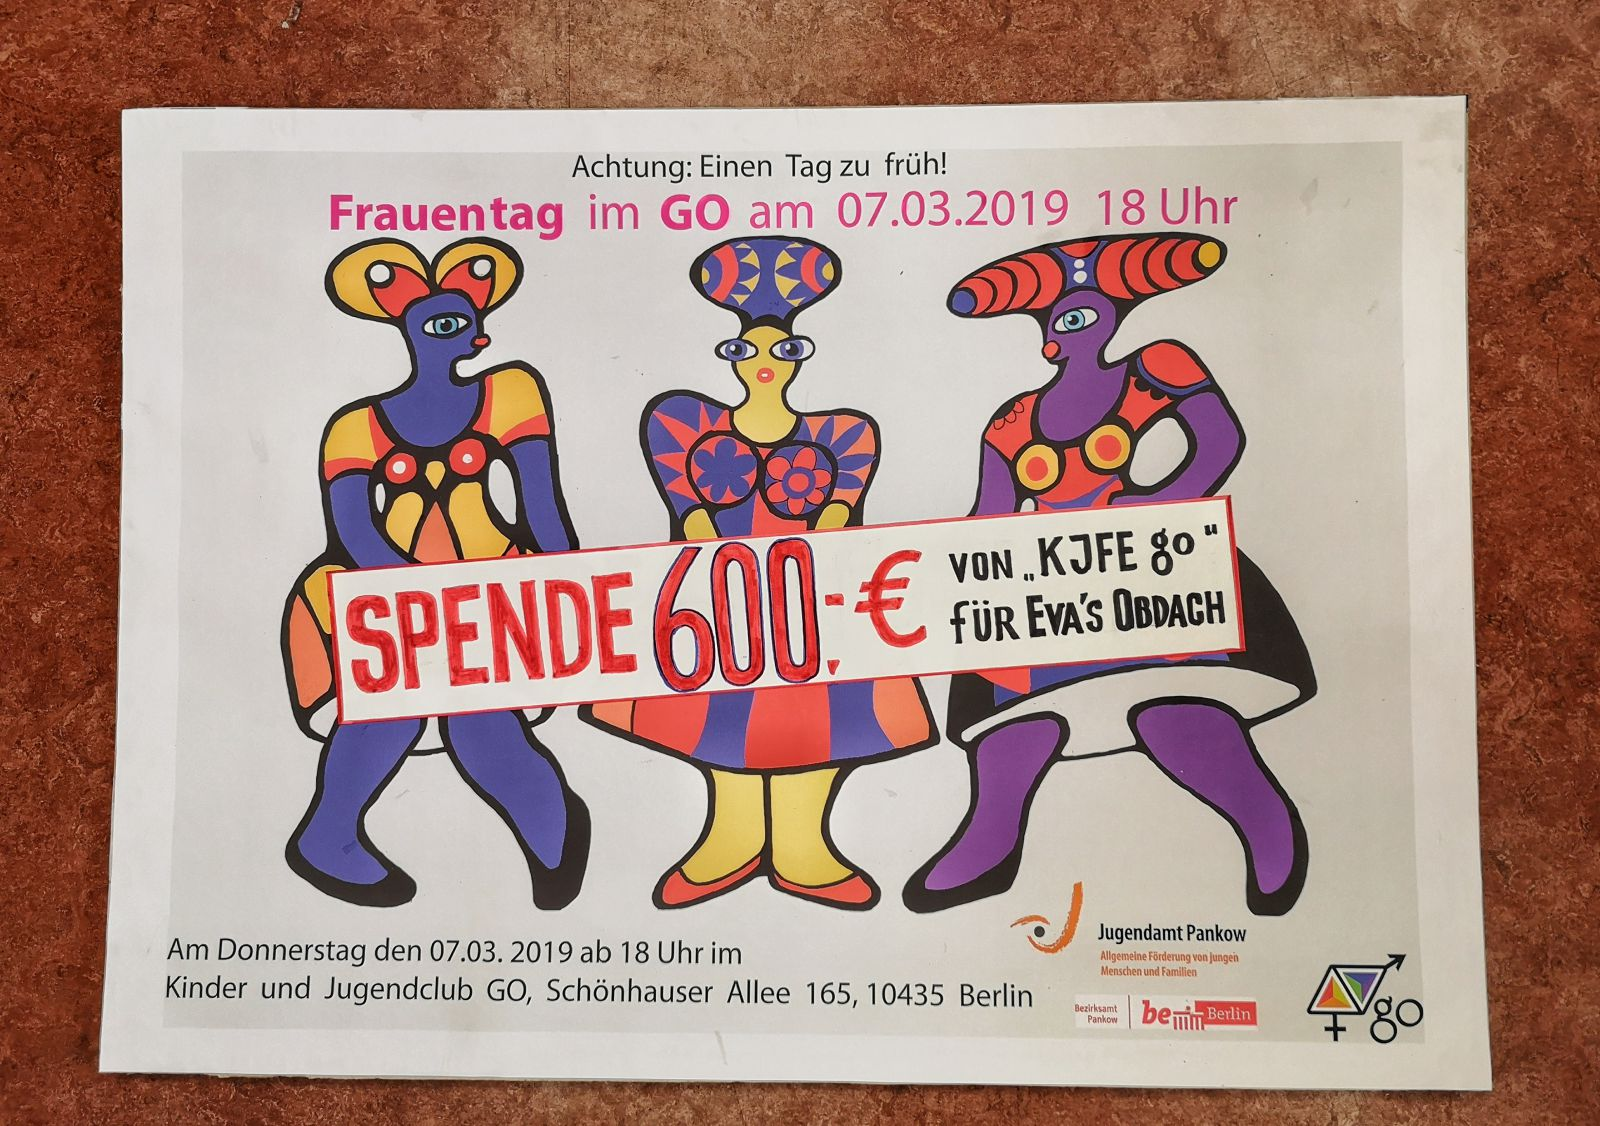 Frauentag - Spende 600 €